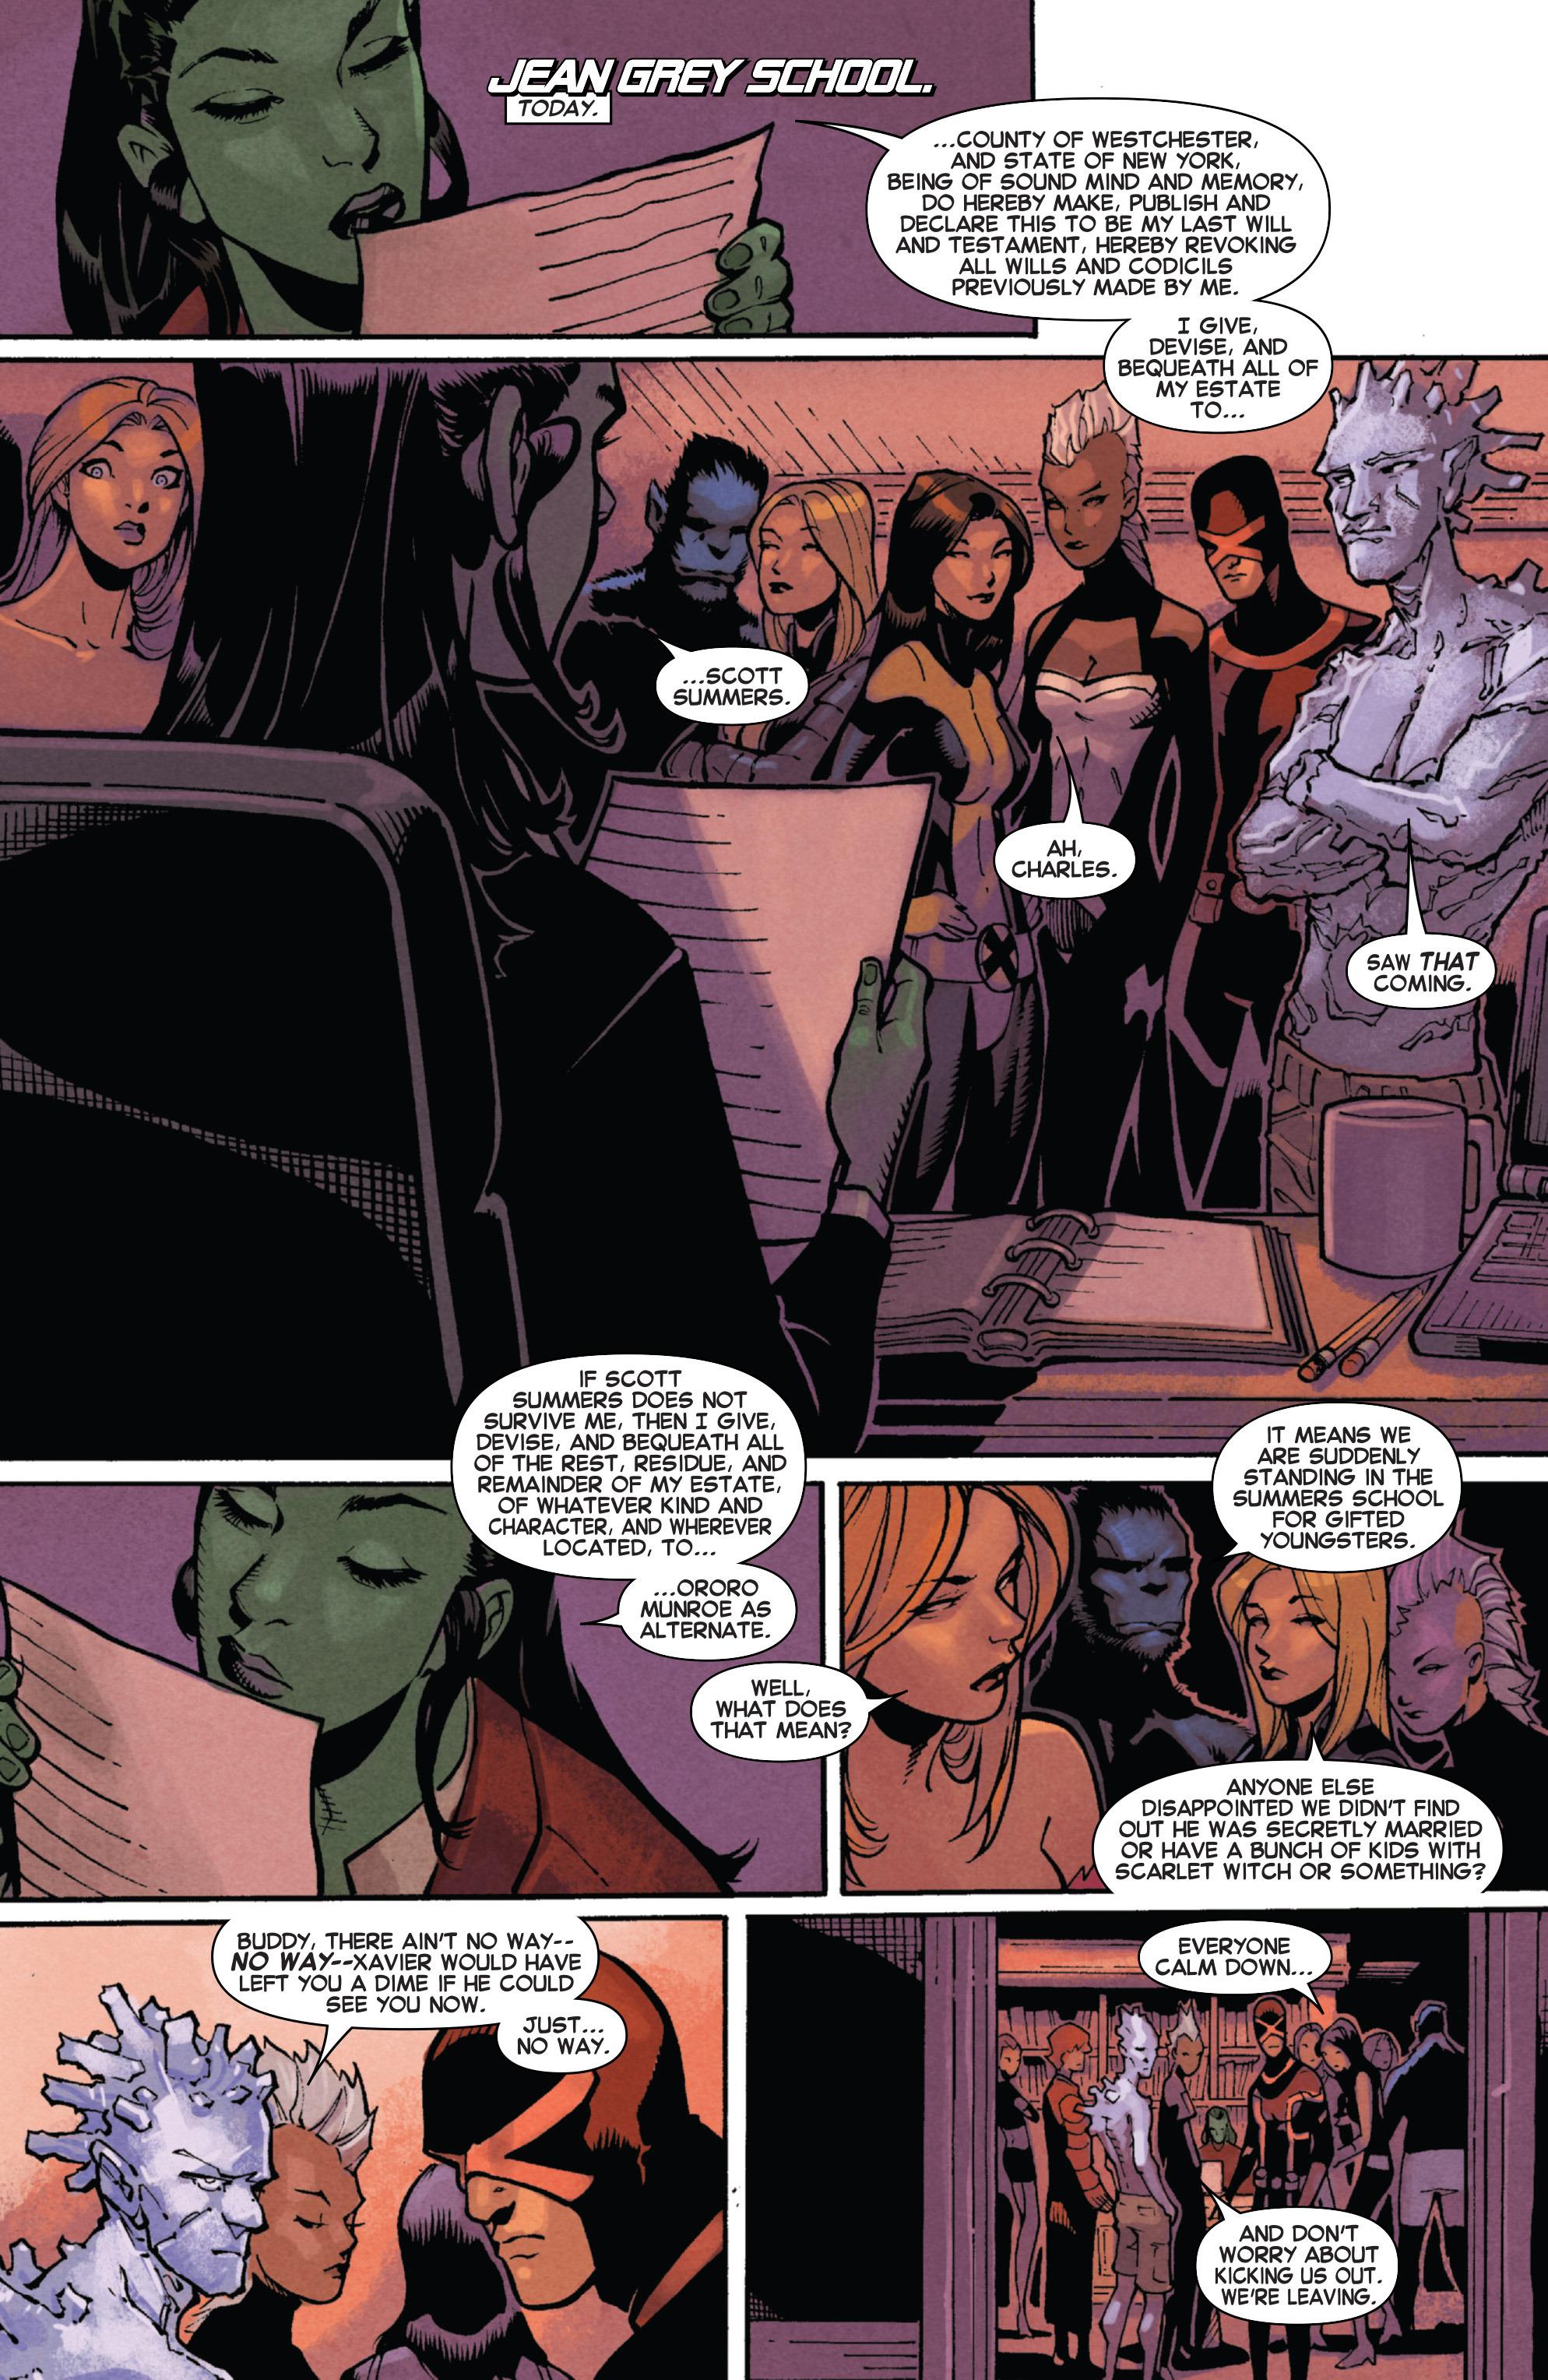 Read online Uncanny X-Men (2013) comic -  Issue # _TPB 5 - The Omega Mutant - 108